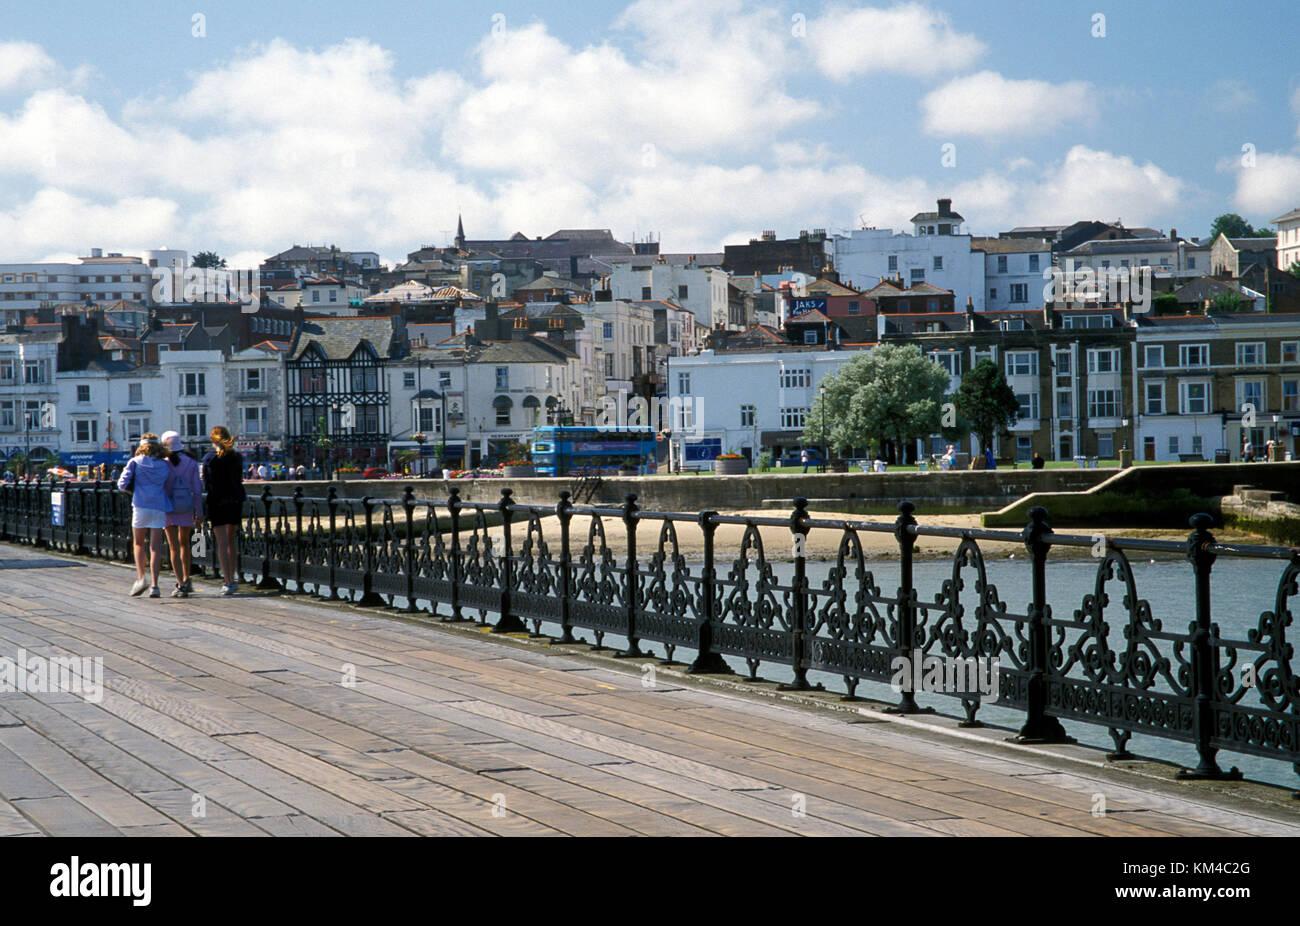 Ryde Pier, Isle of Wight, Hampshire, England - Stock Image